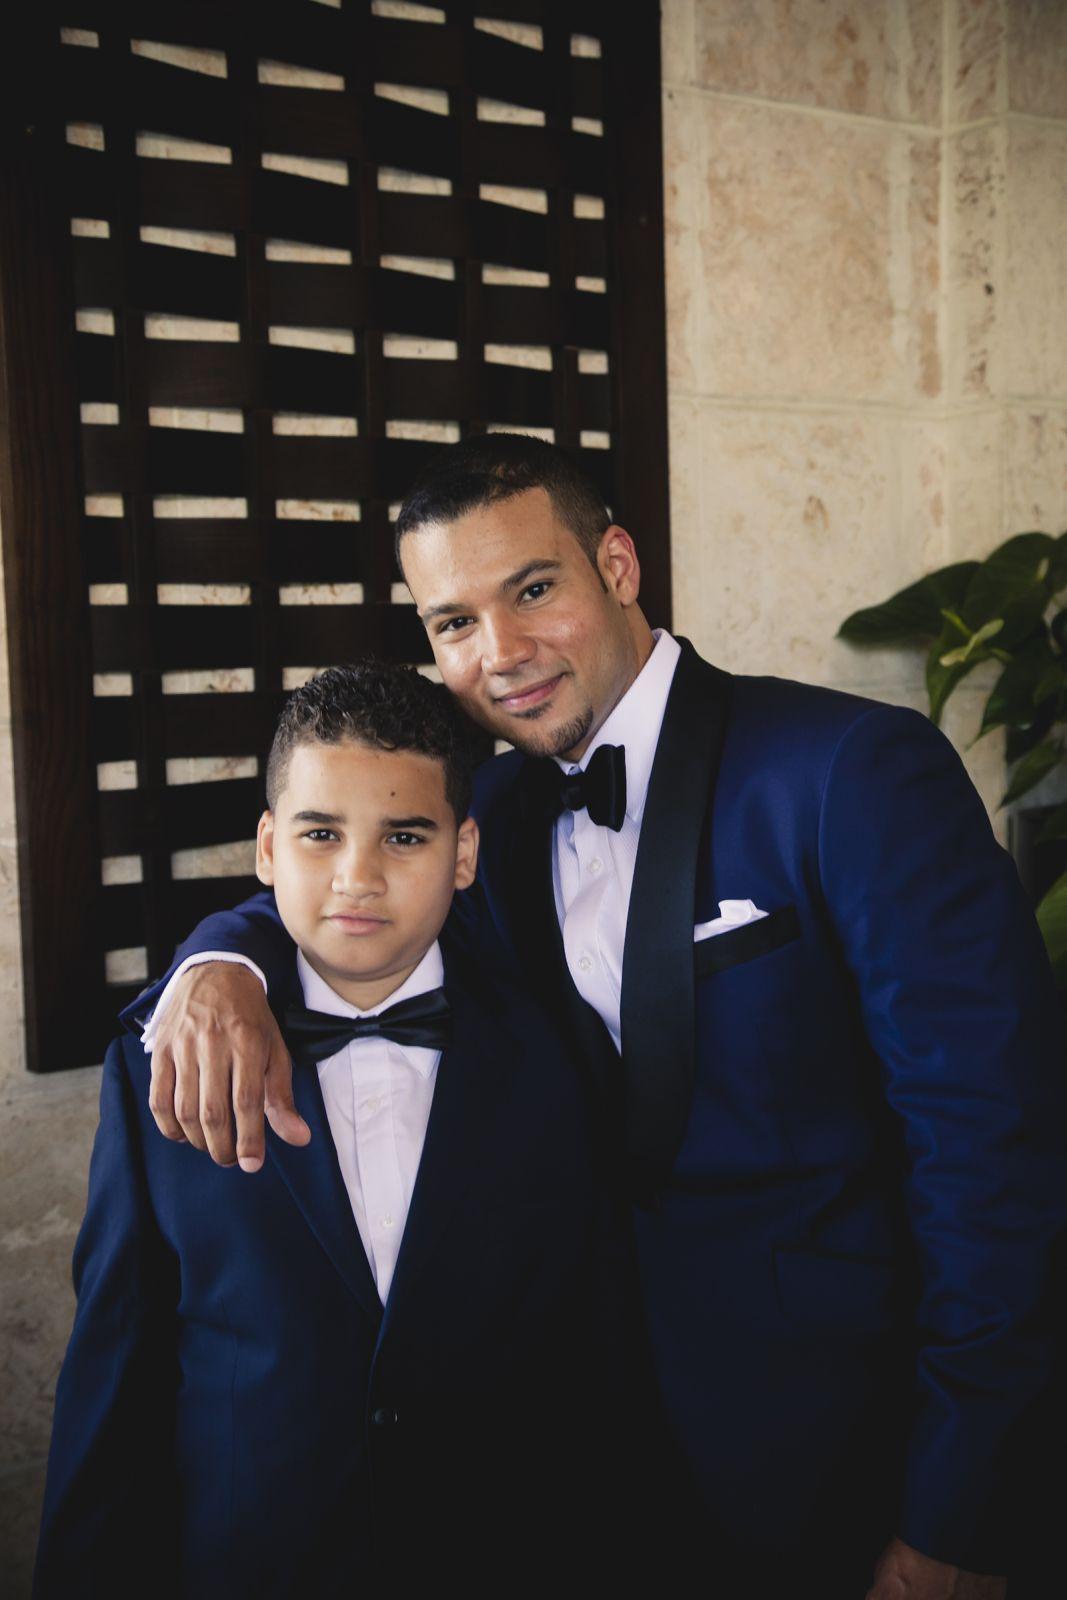 The groom and junior groomsmen